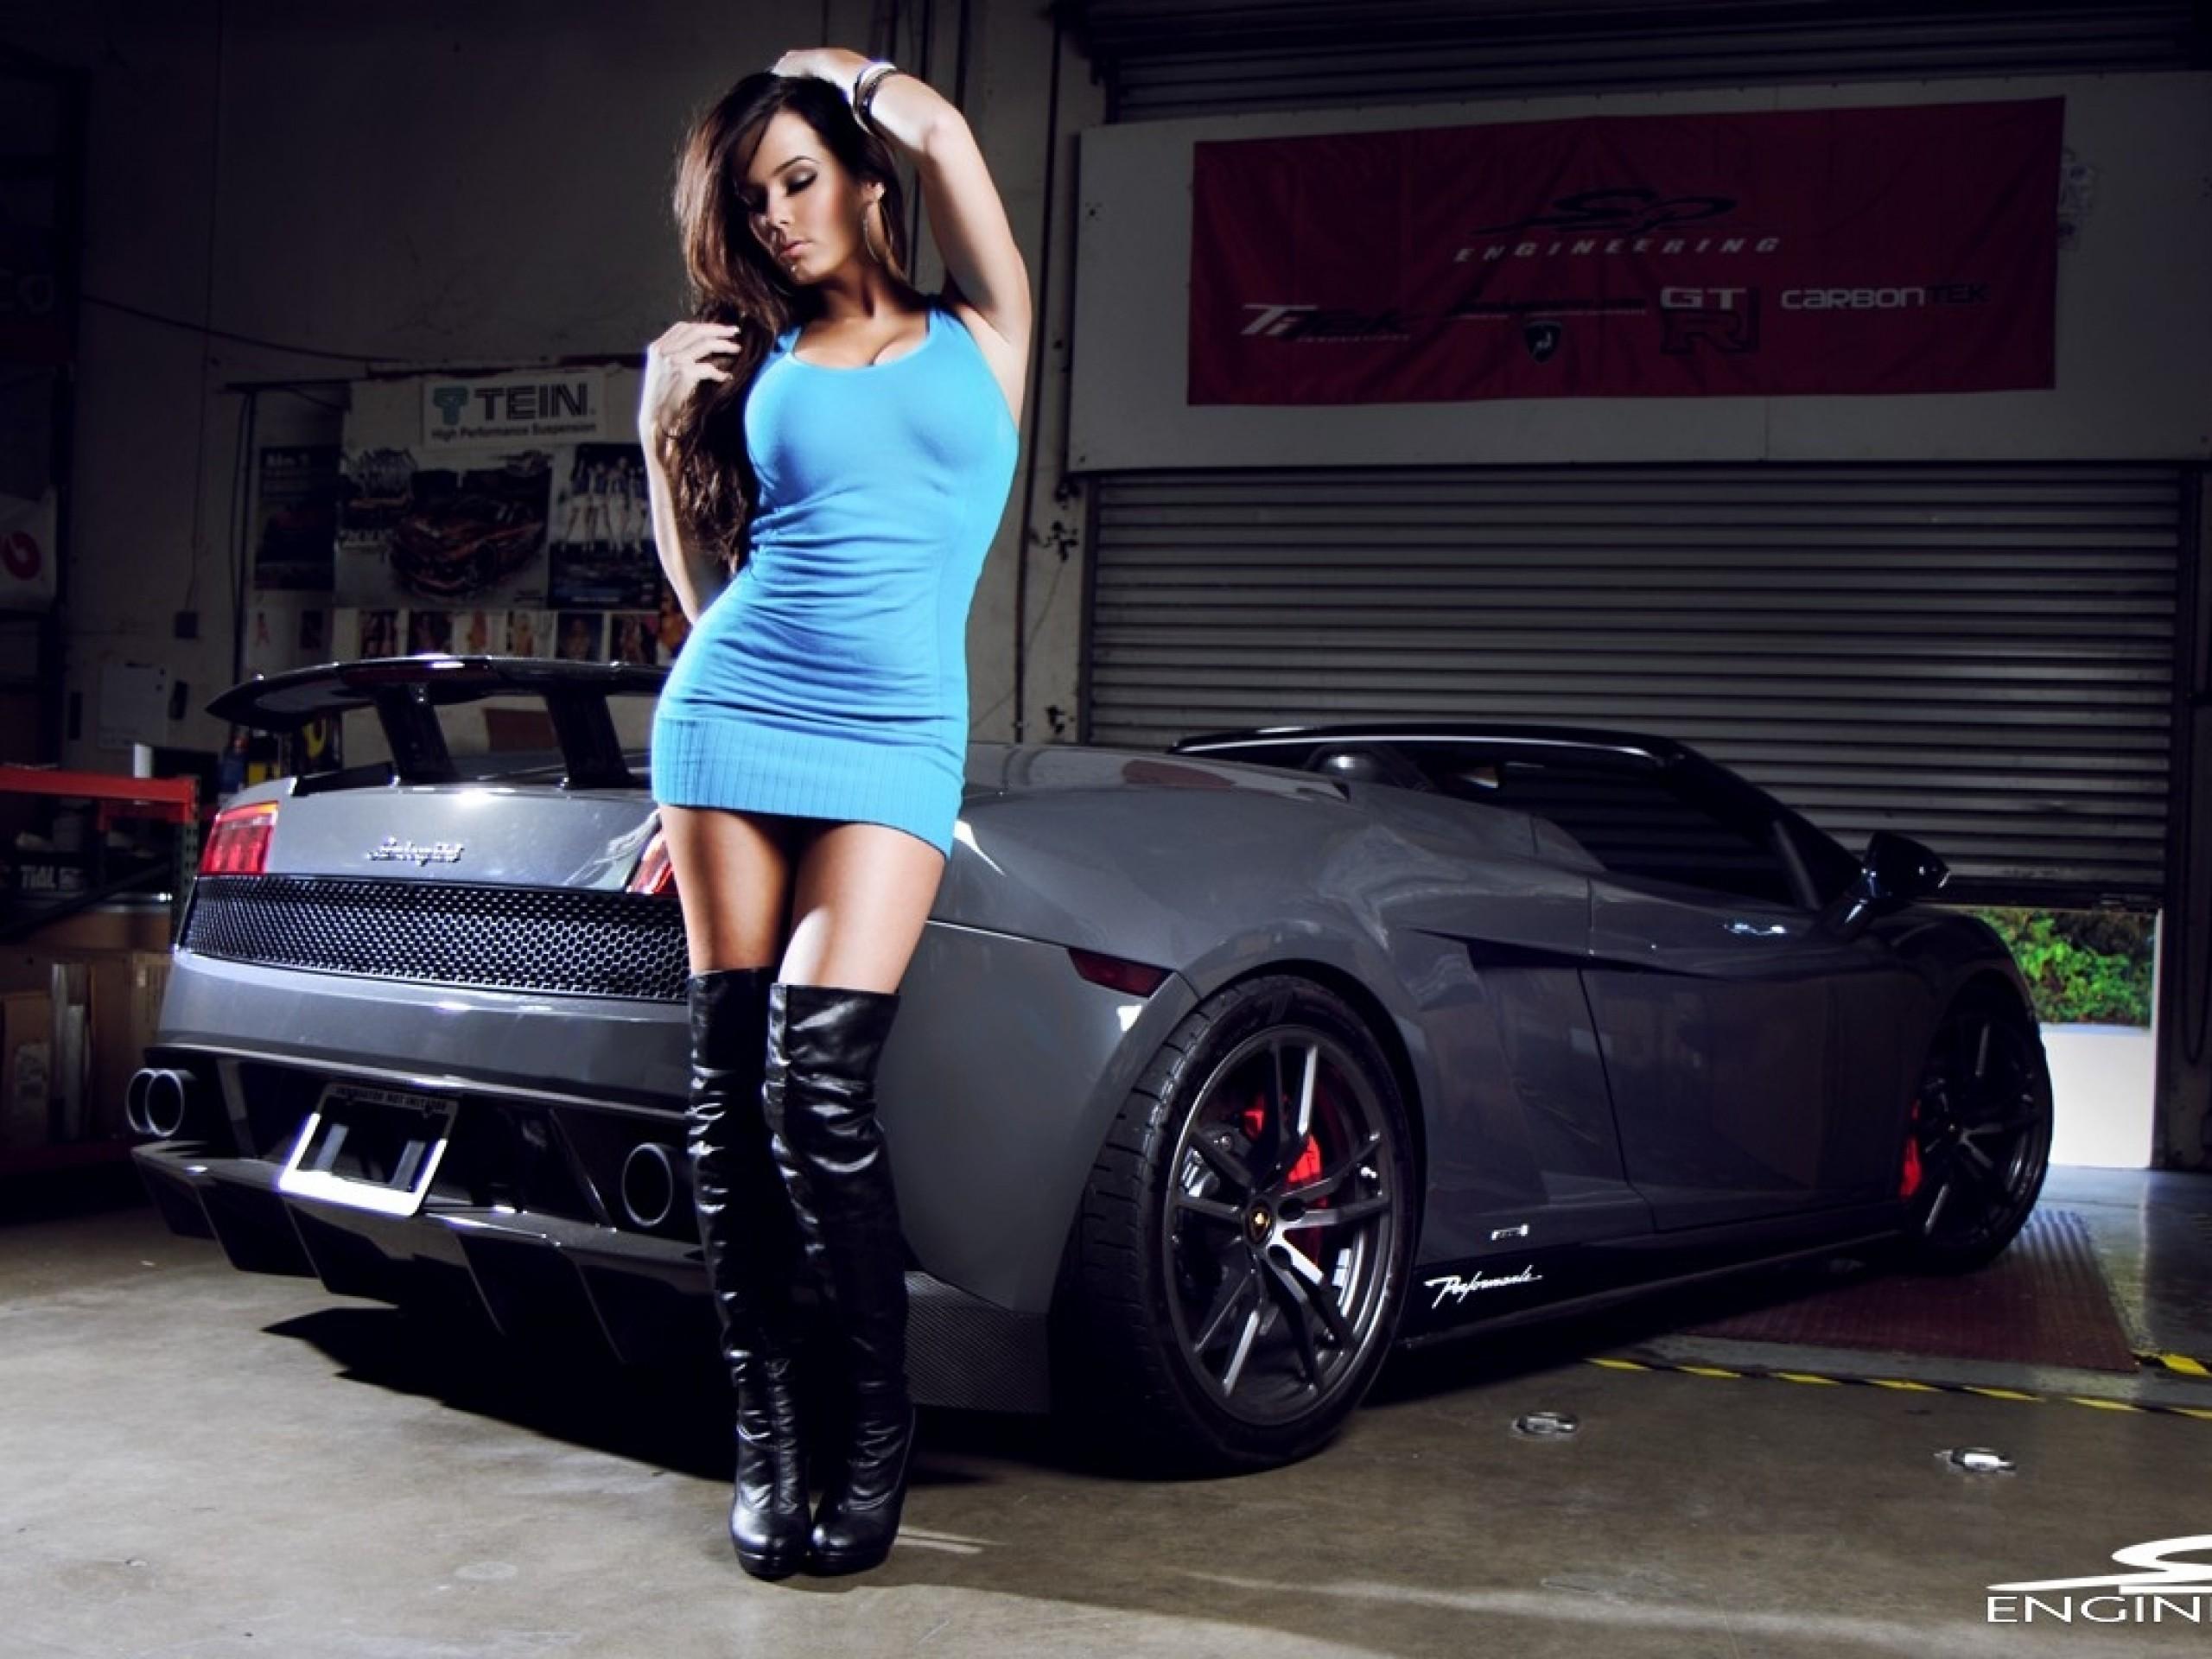 women lamborghini blue dress girls with cars leather boots wallpaper – Cars  Lamborghini HD Desktop Wallpaper